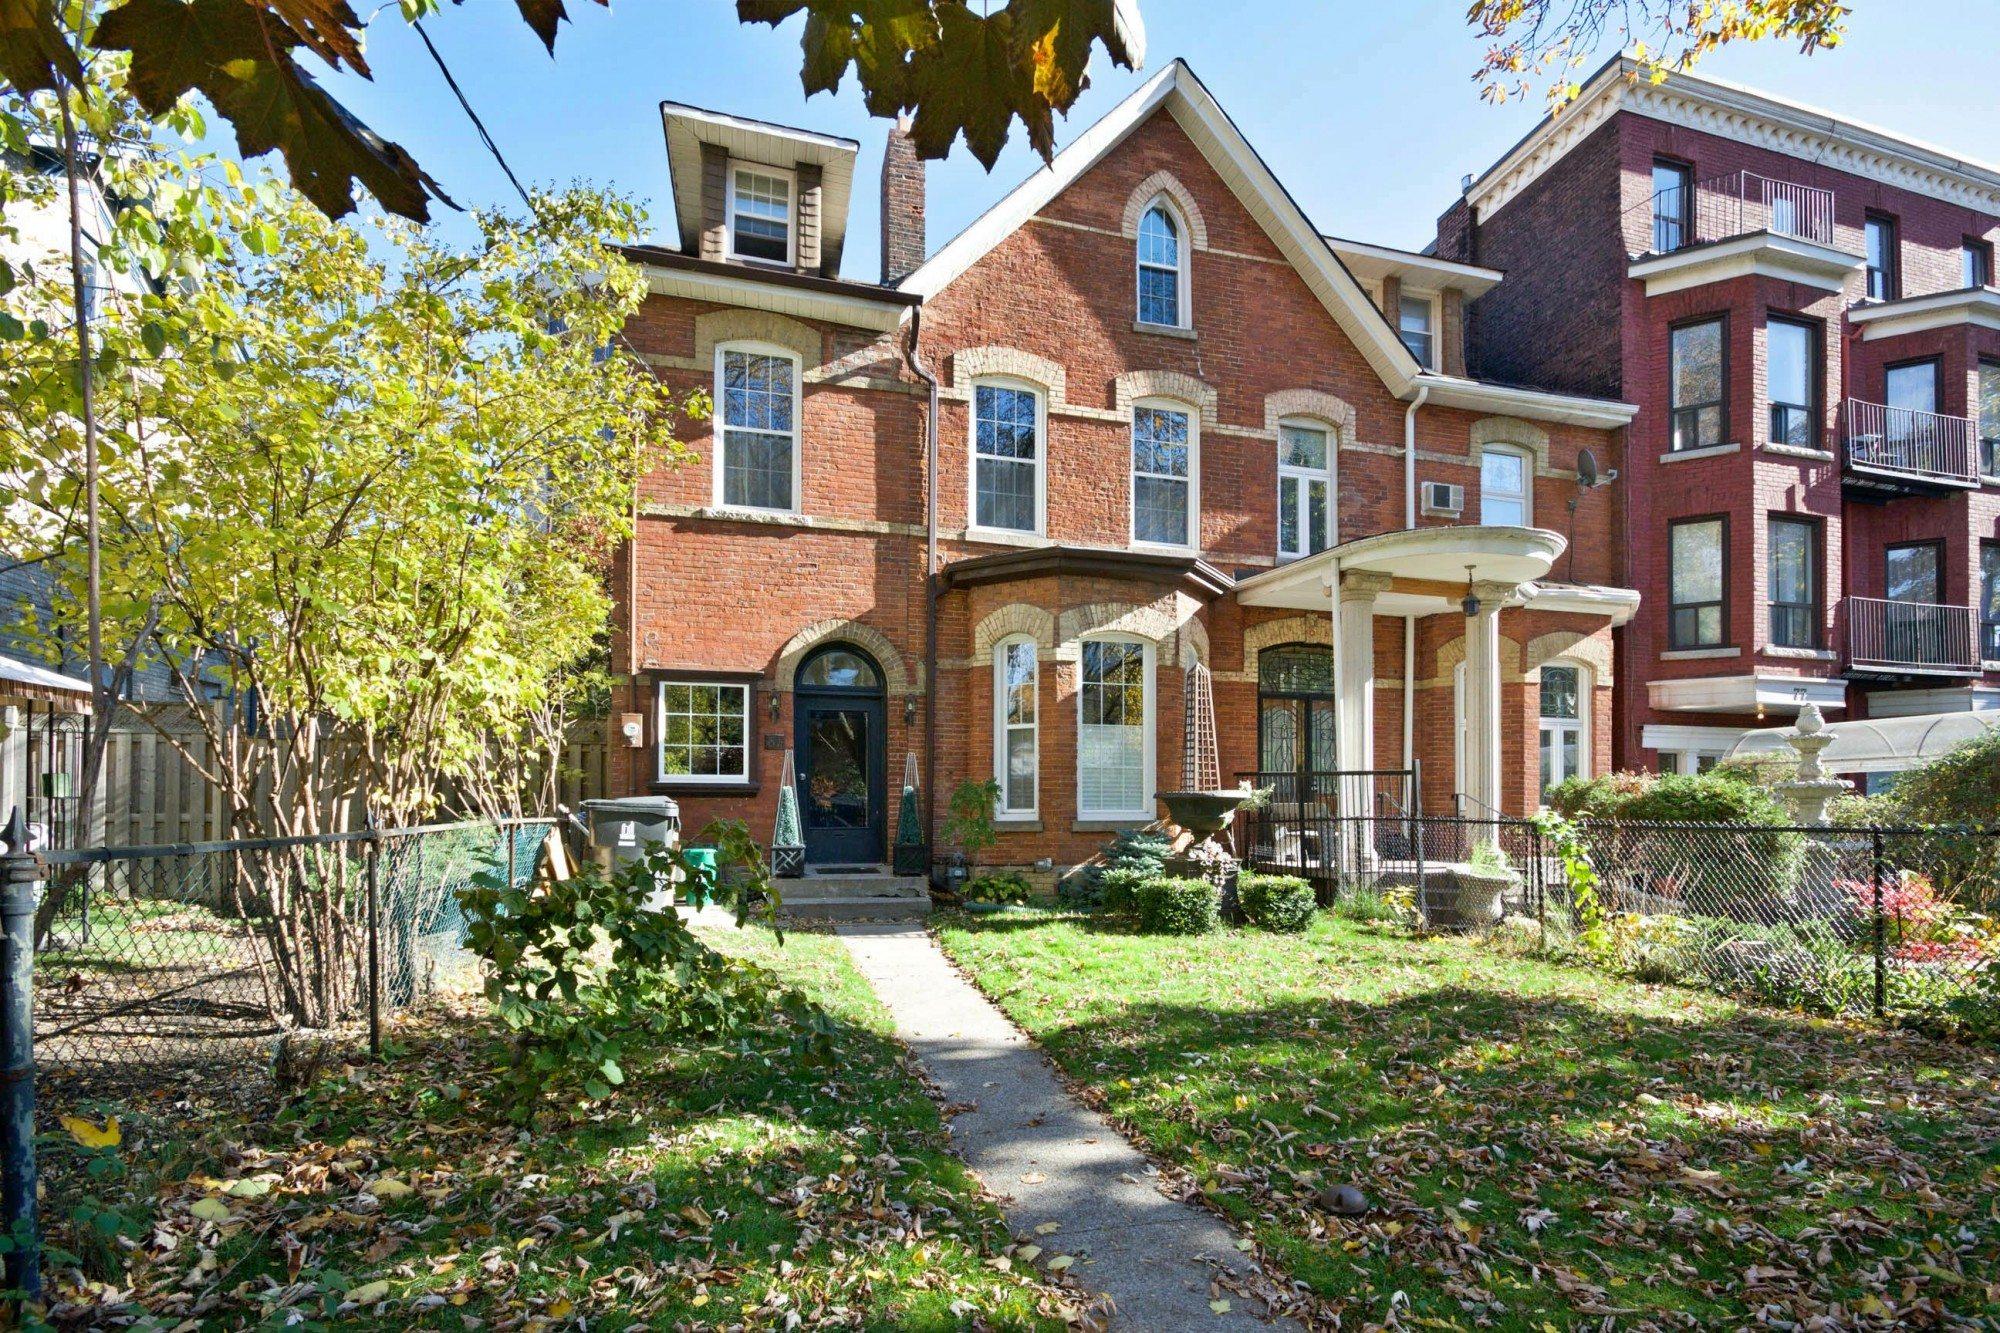 toronto-house-for-sale-81-pembroke-street-2